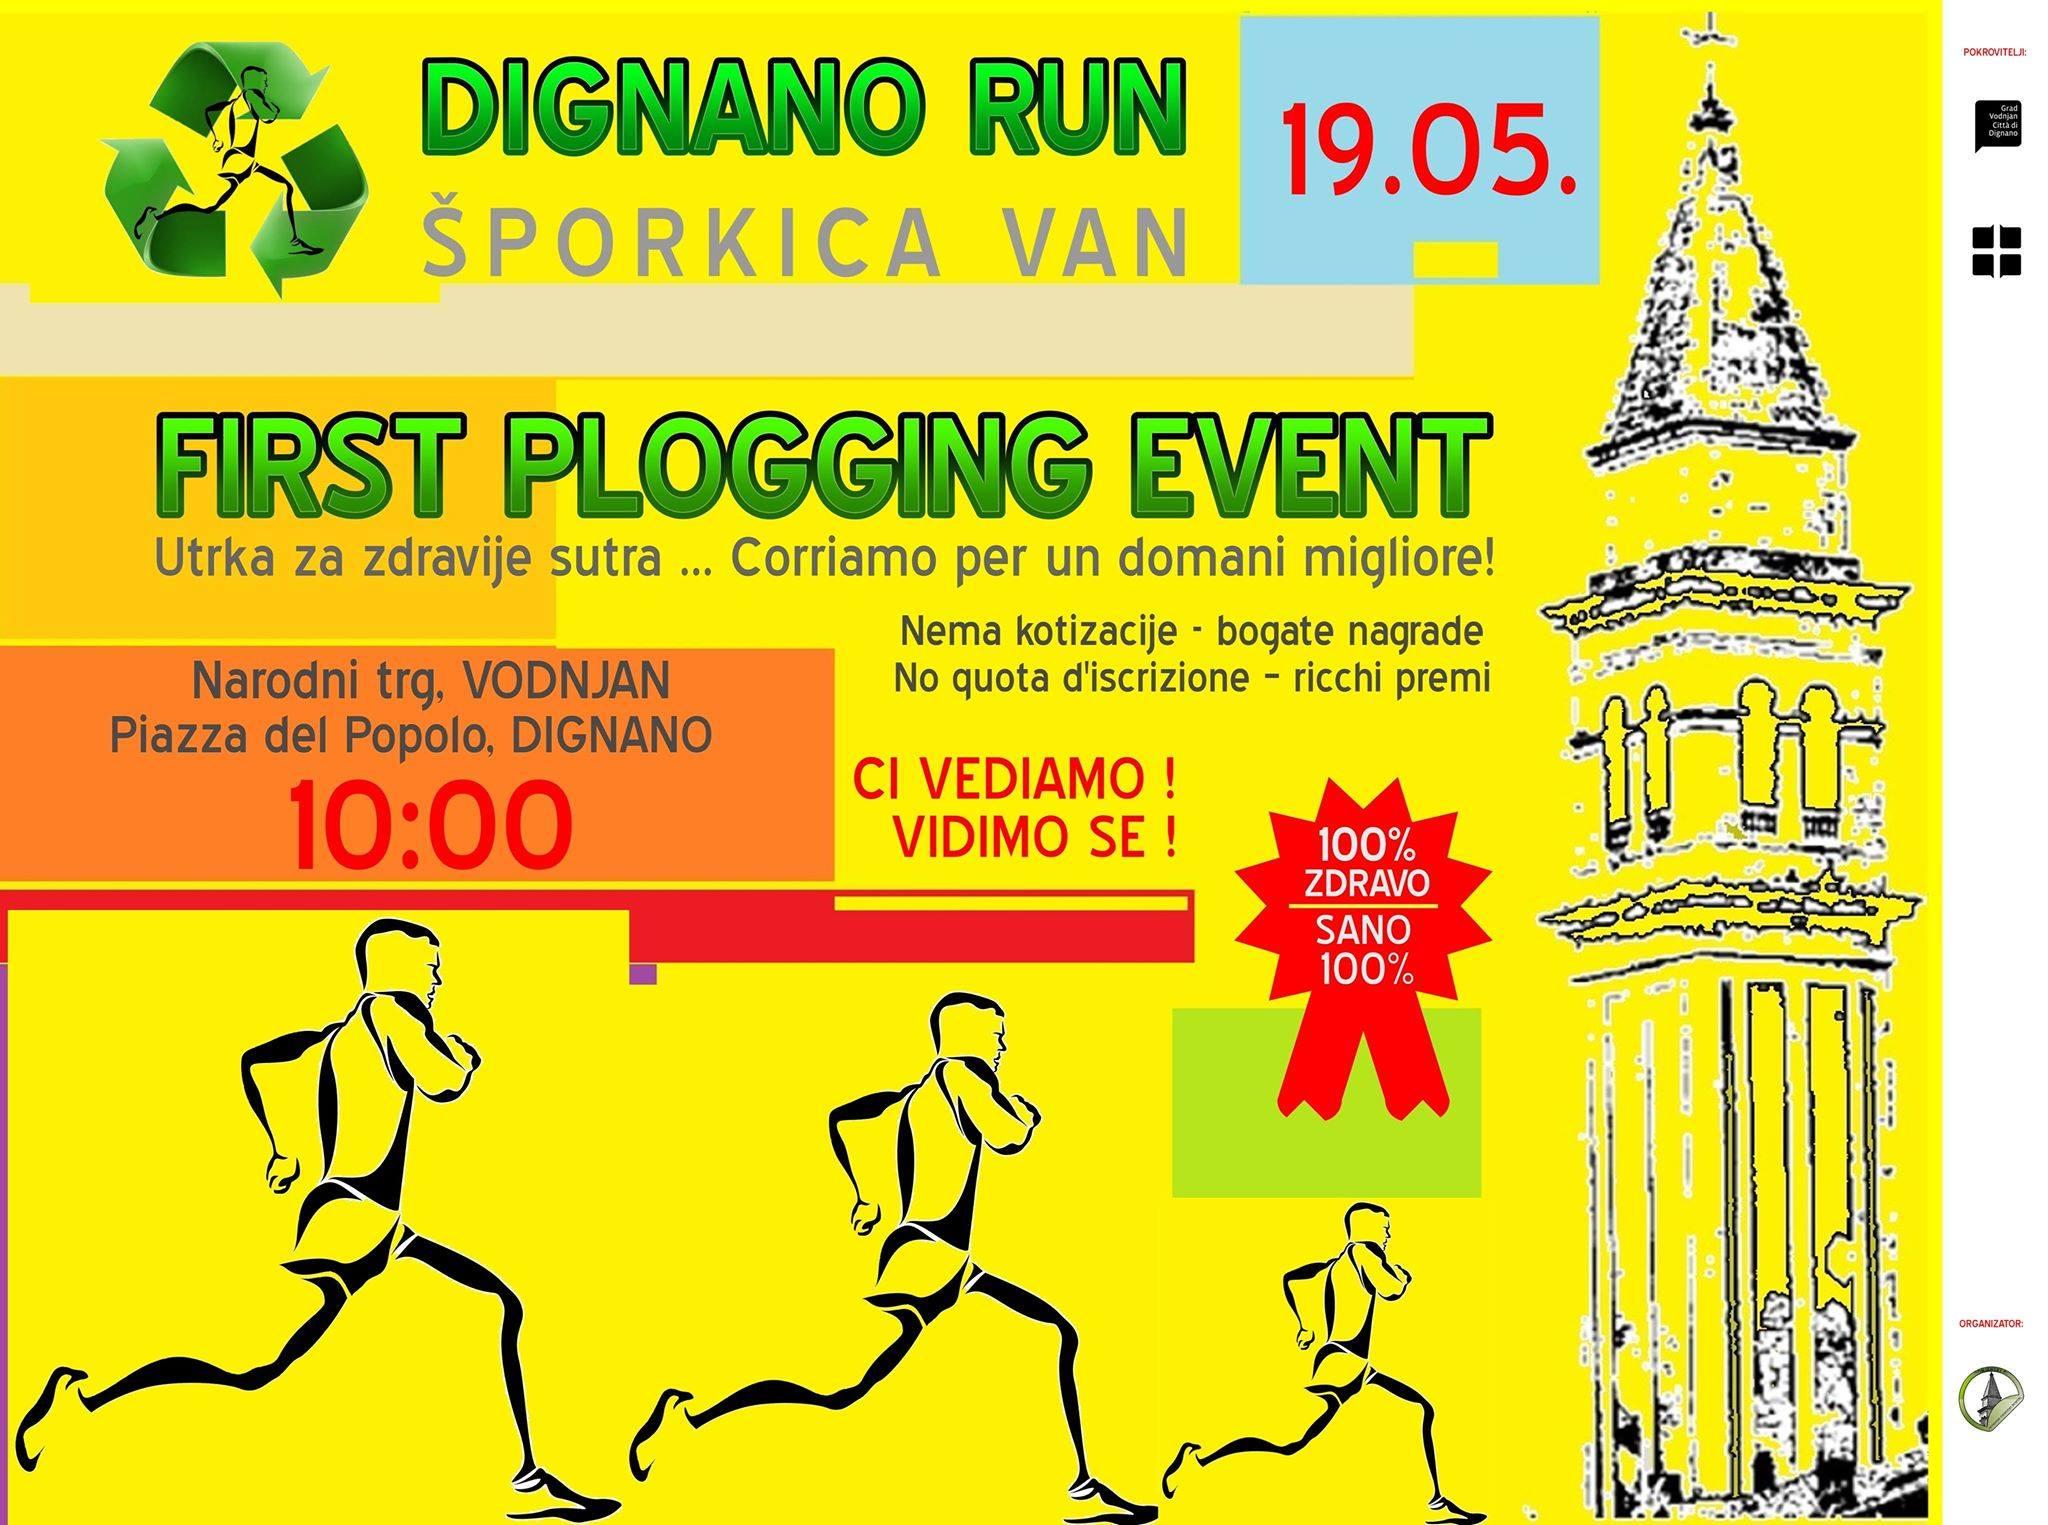 Plakat prve plogging utrke Dignano run